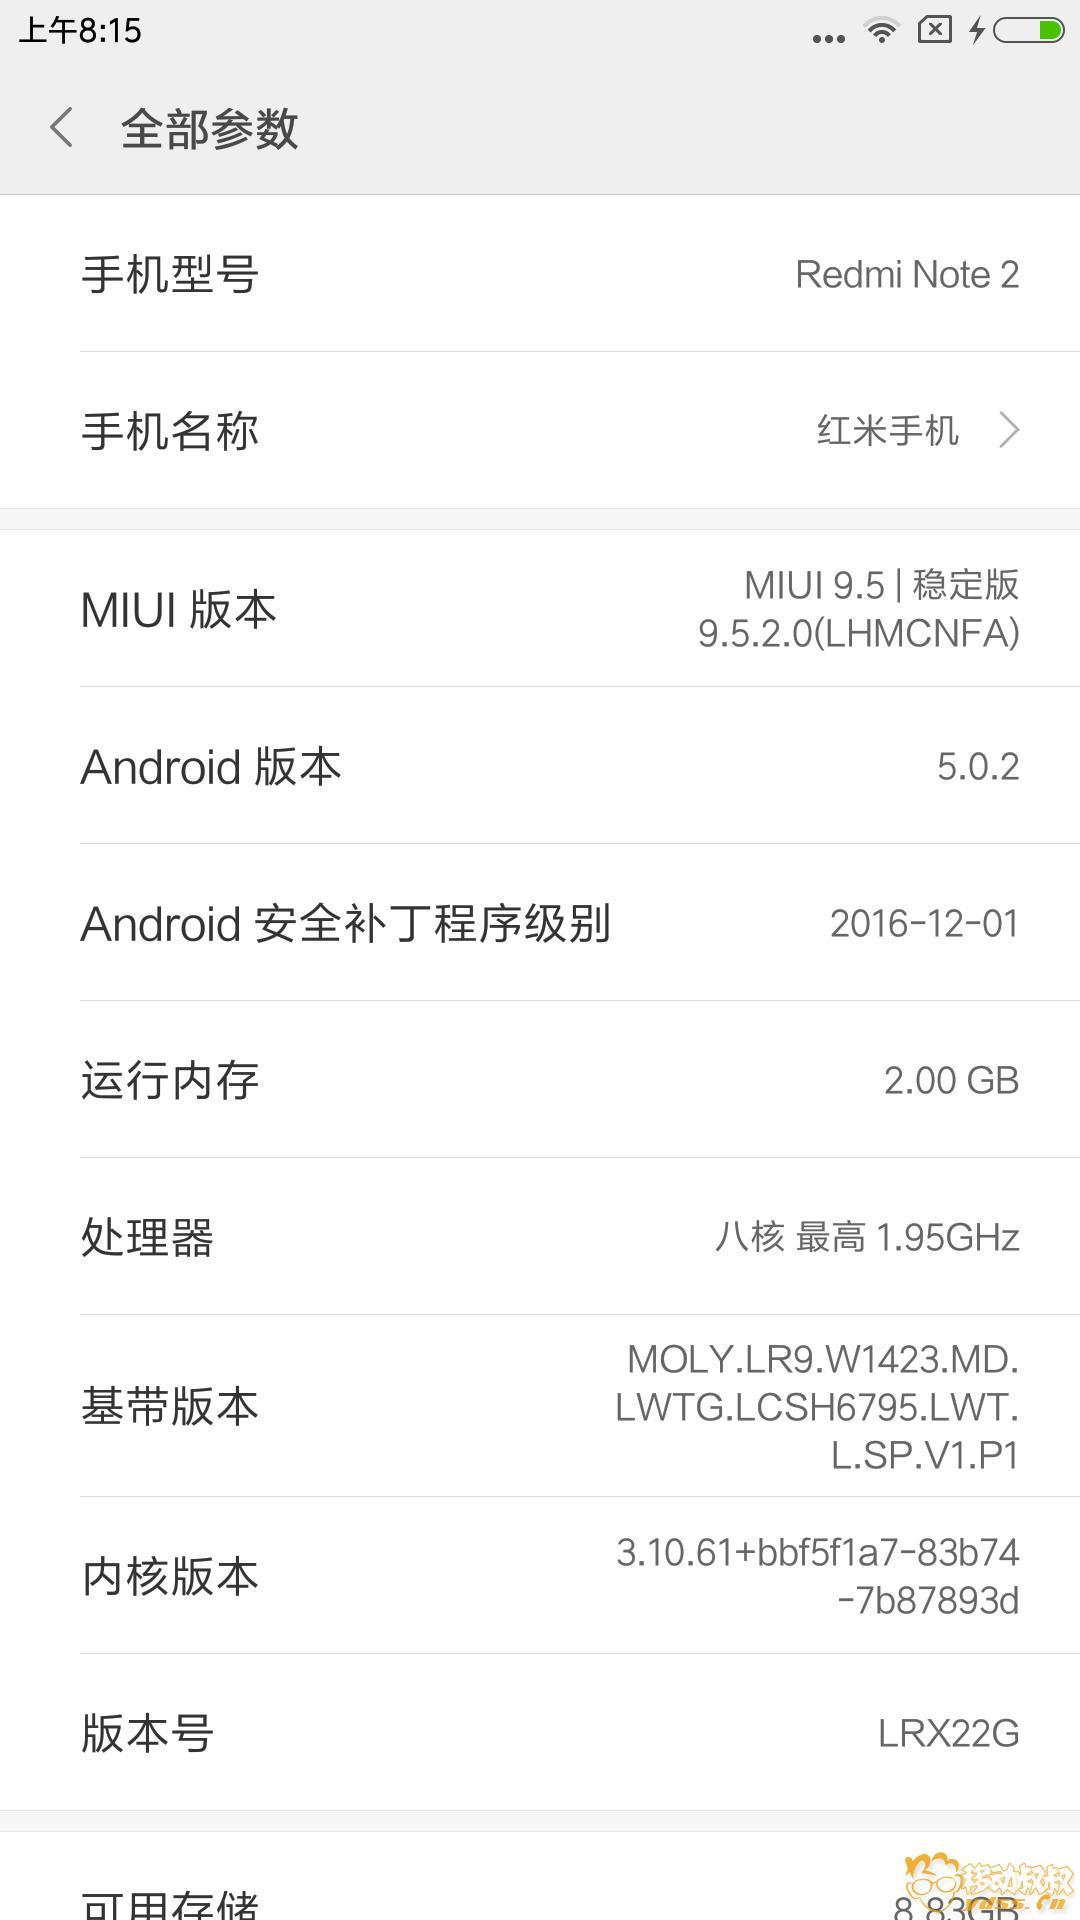 Screenshot_2018-05-17-08-15-35-948_com.android.settings.png